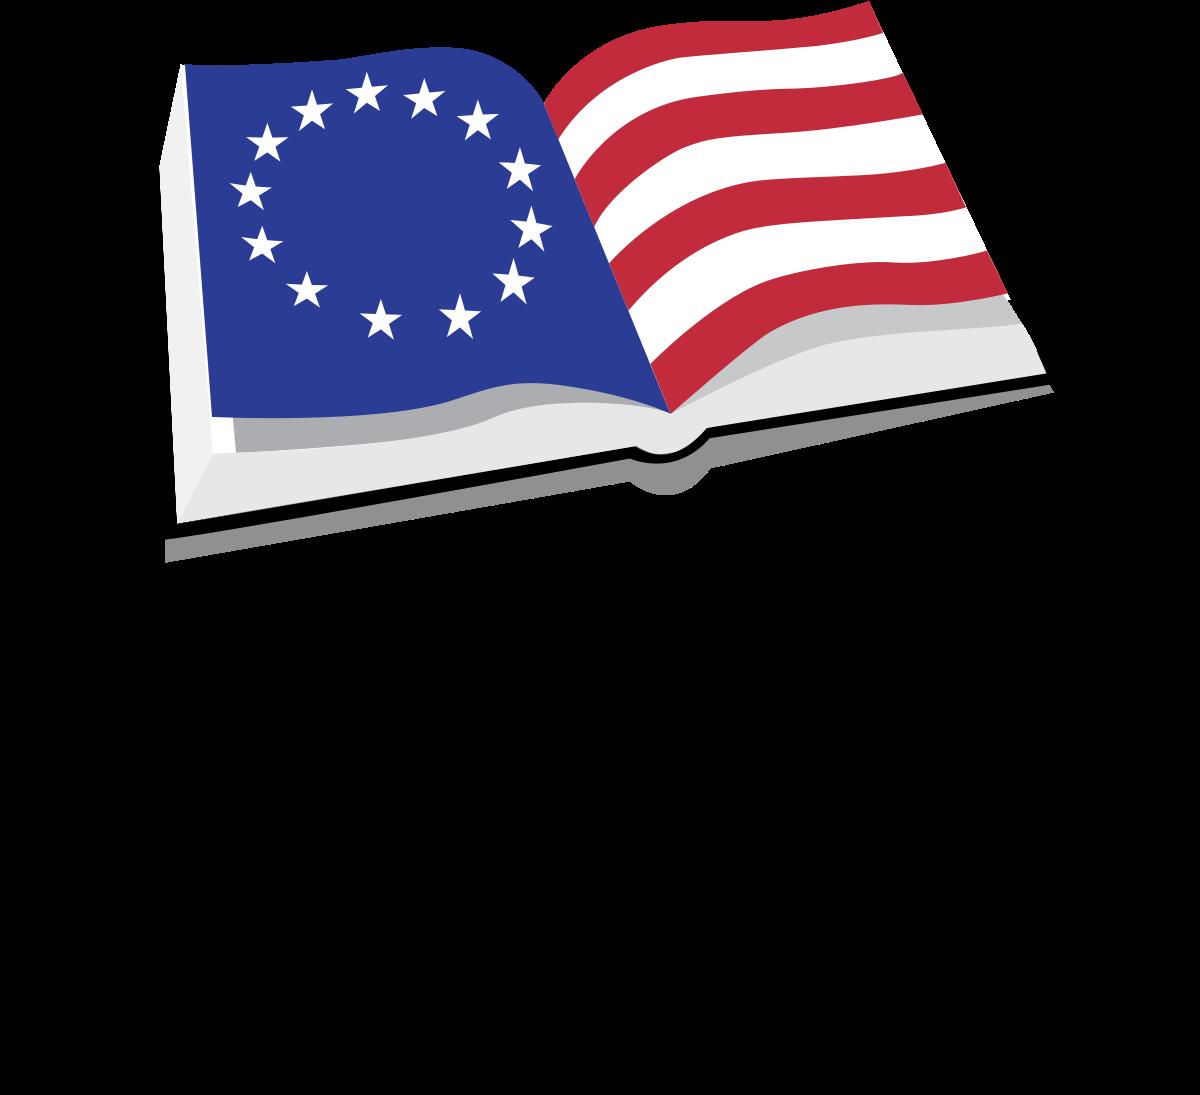 American memory wikipedia . America clipart history us